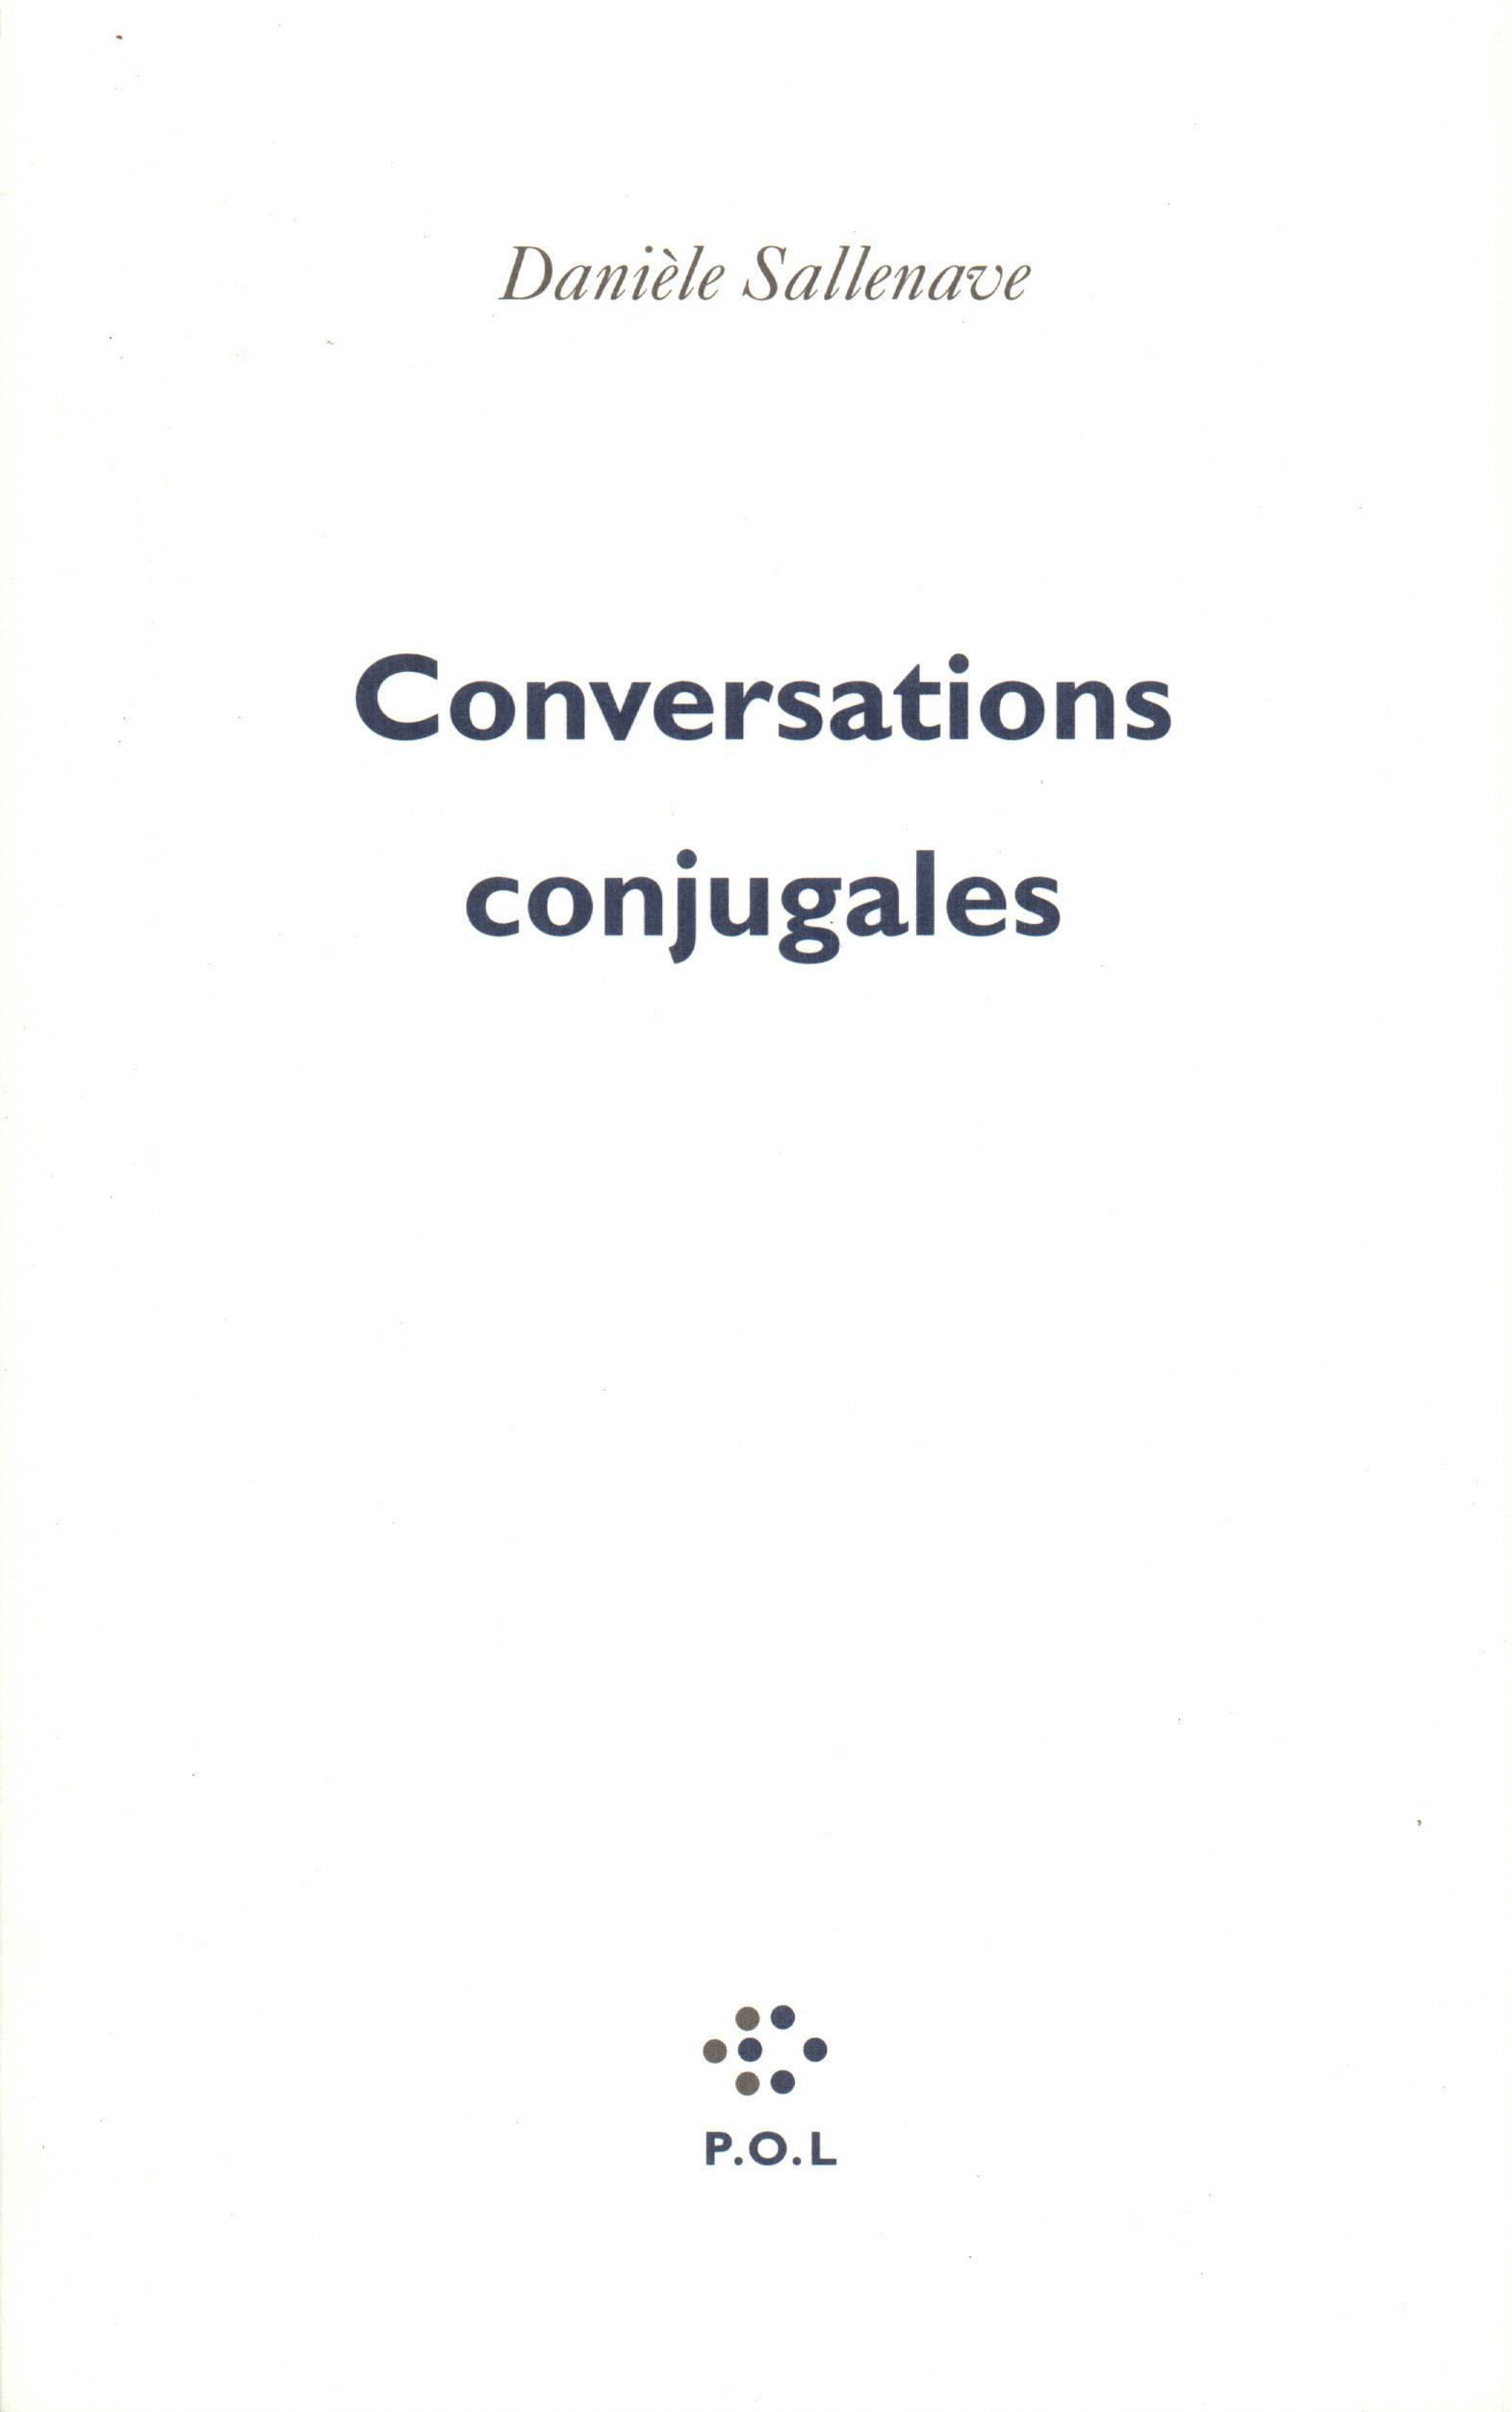 Conversations conjugales